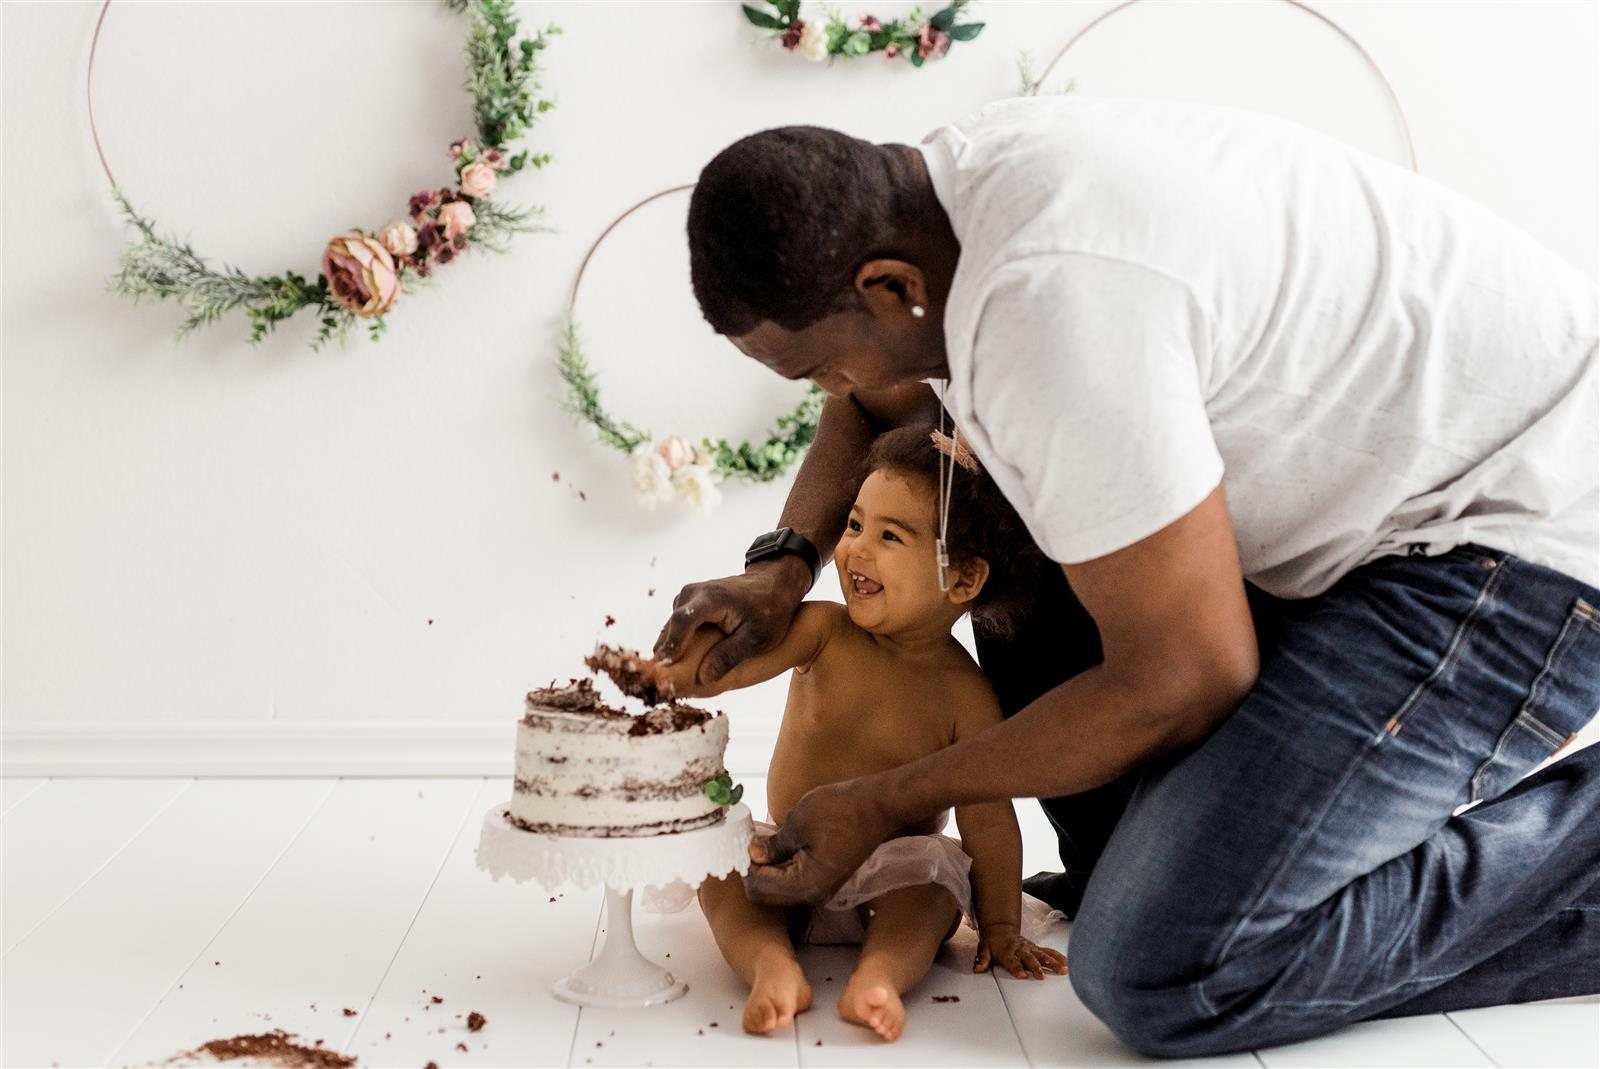 Cake Smash Fotografiranje | Neža Reisner Photography - fotografiranje otrok, dojenčkov, fotografiranje s torto